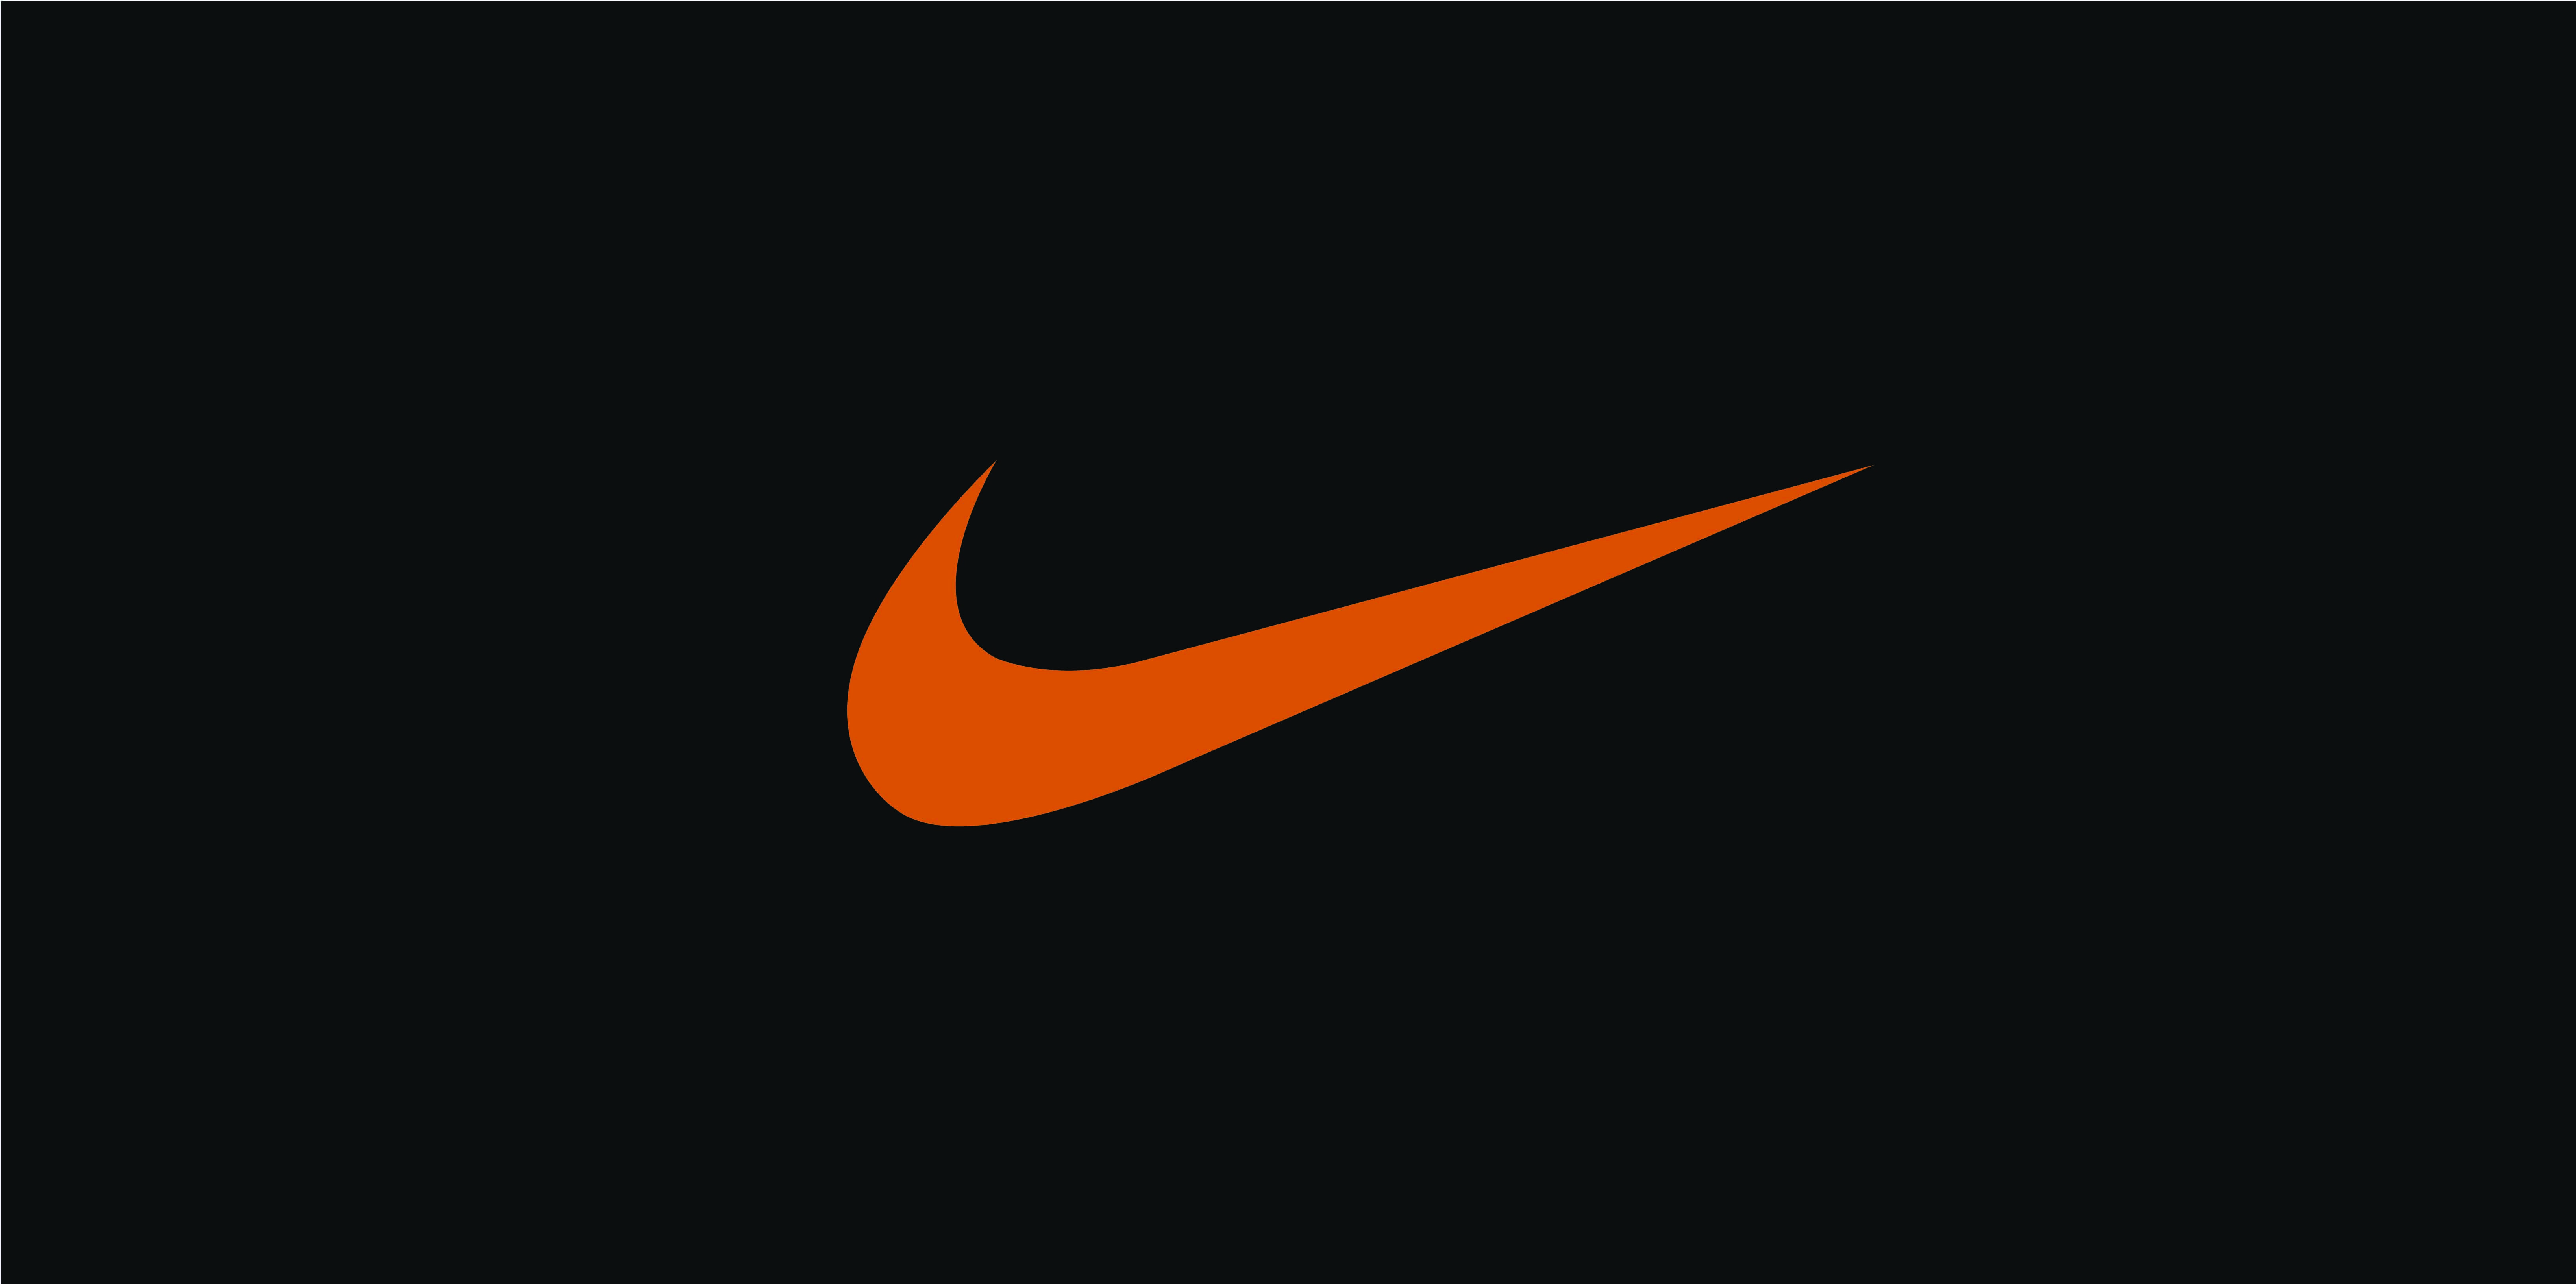 Nike Swoosh Wallpapers 6544x3263